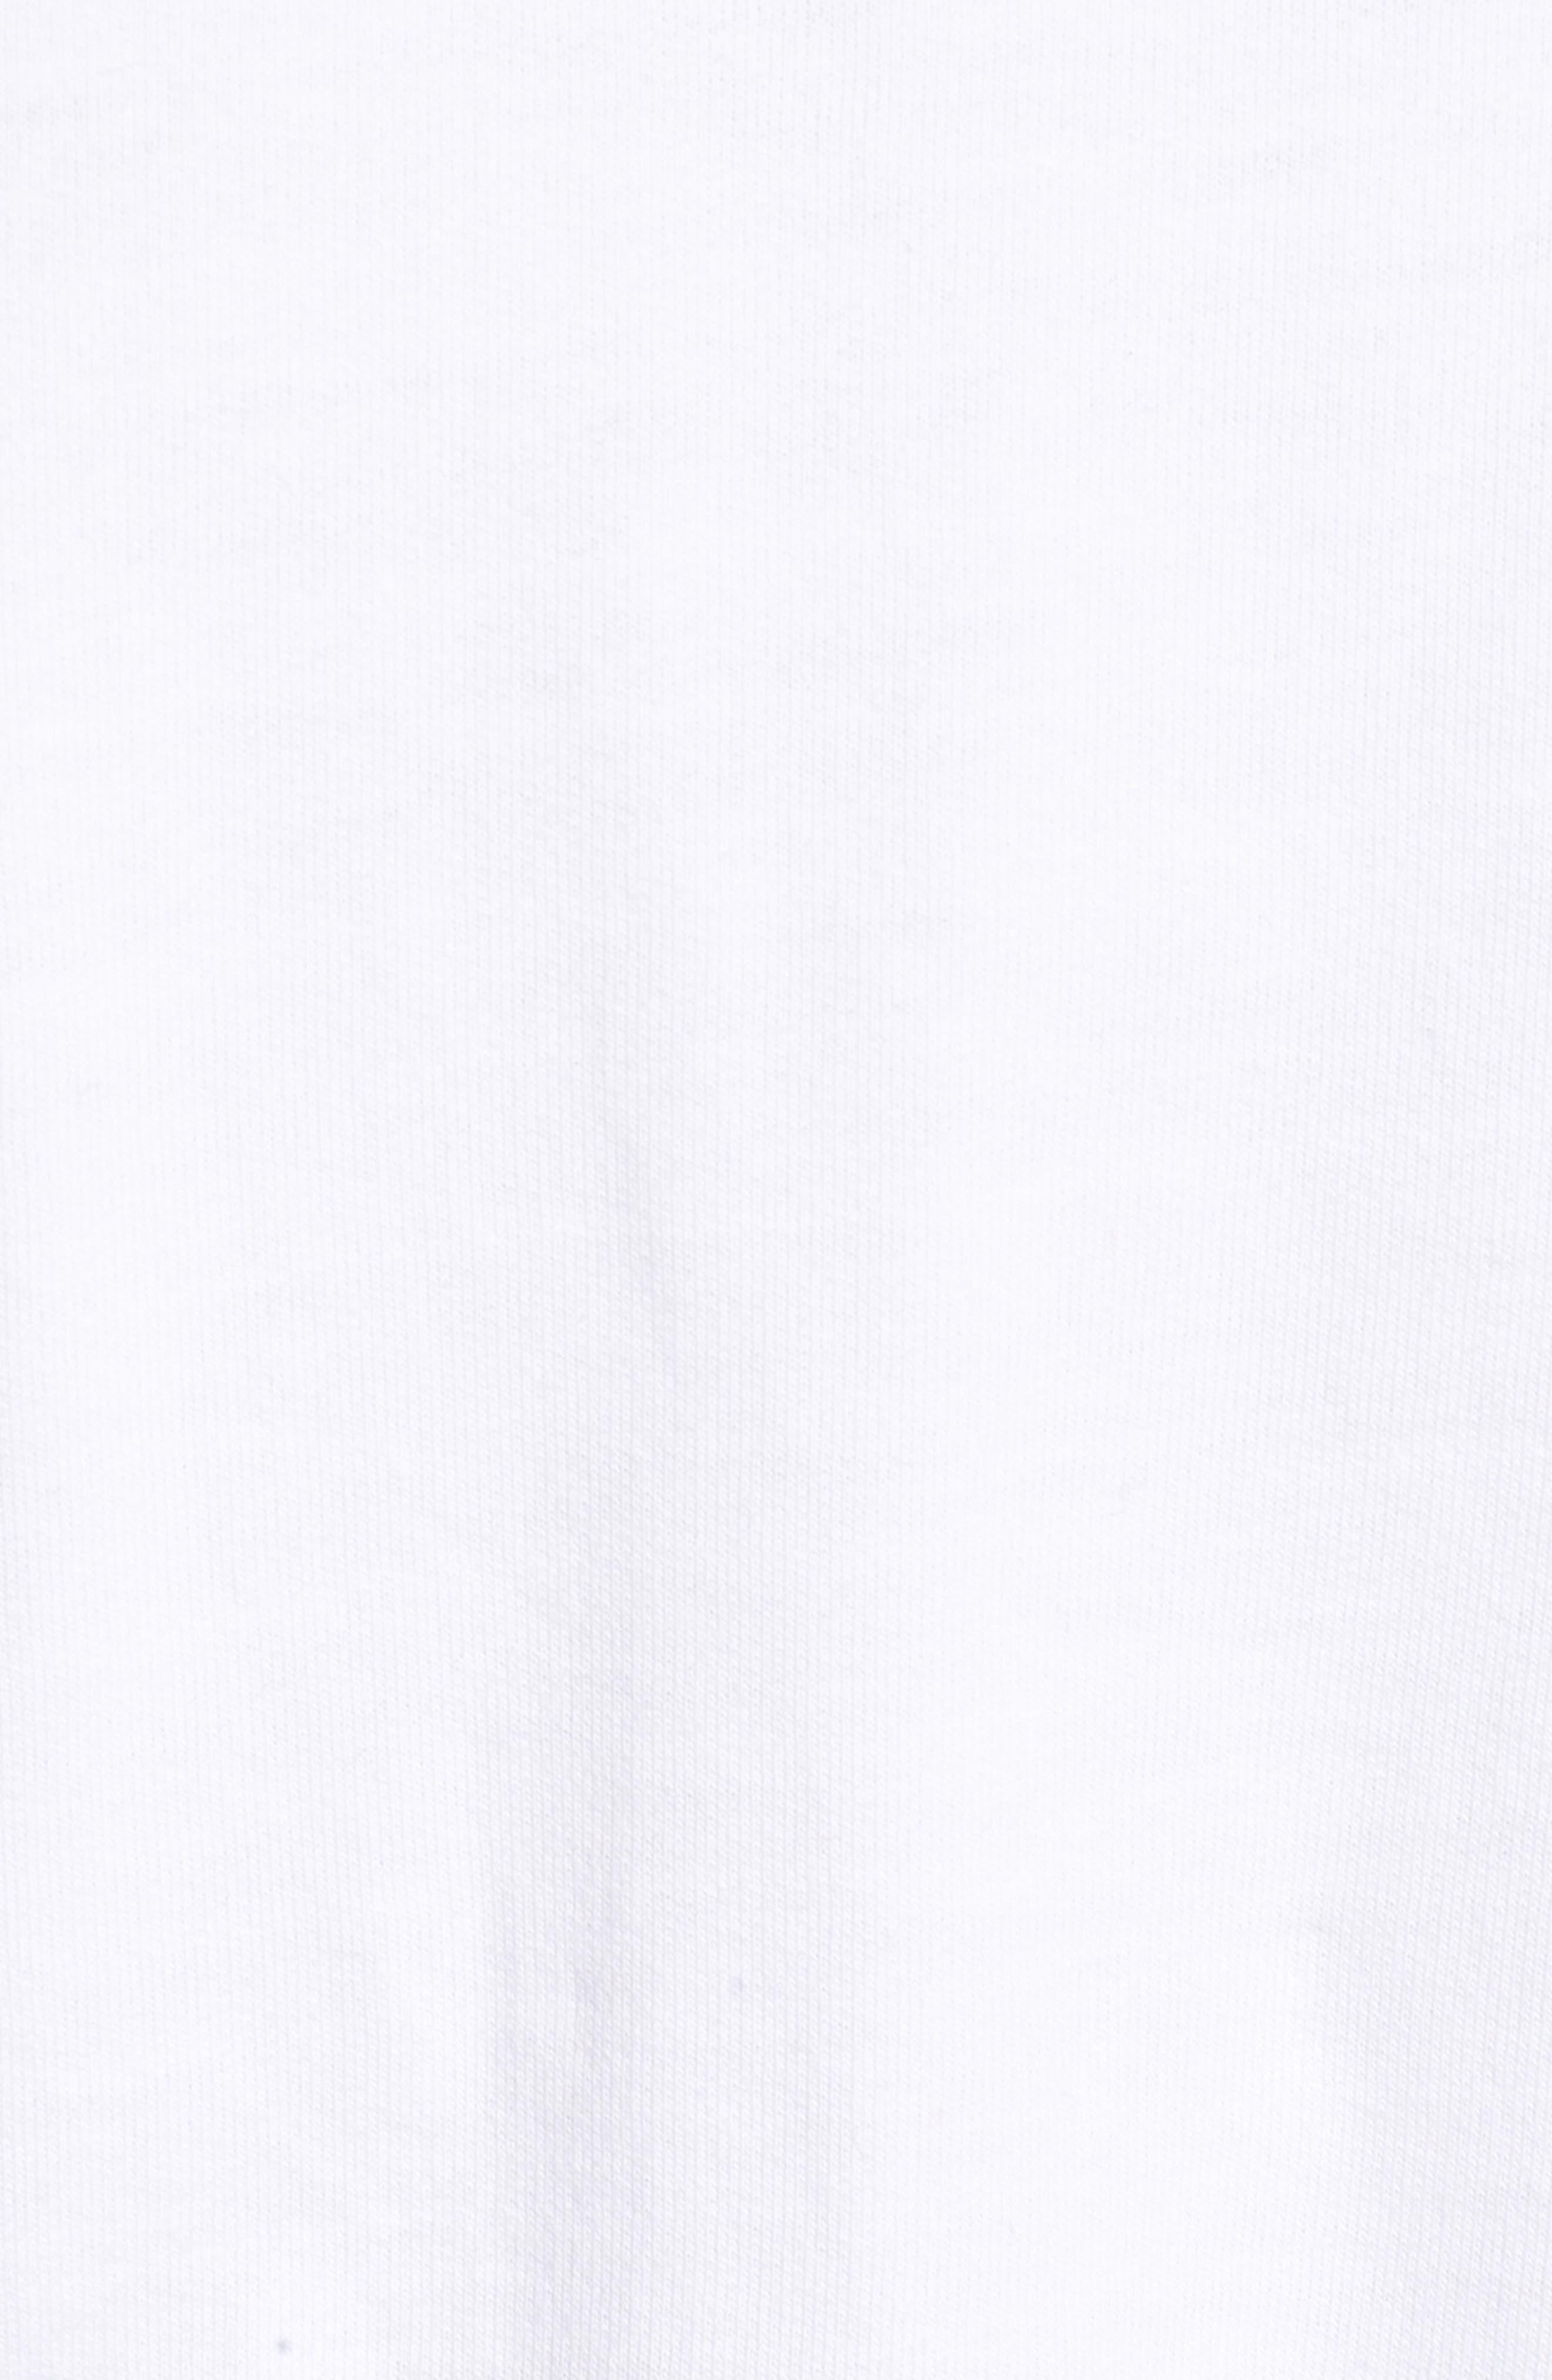 Bamm Bamm Crop Sweatshirt,                             Alternate thumbnail 5, color,                             White